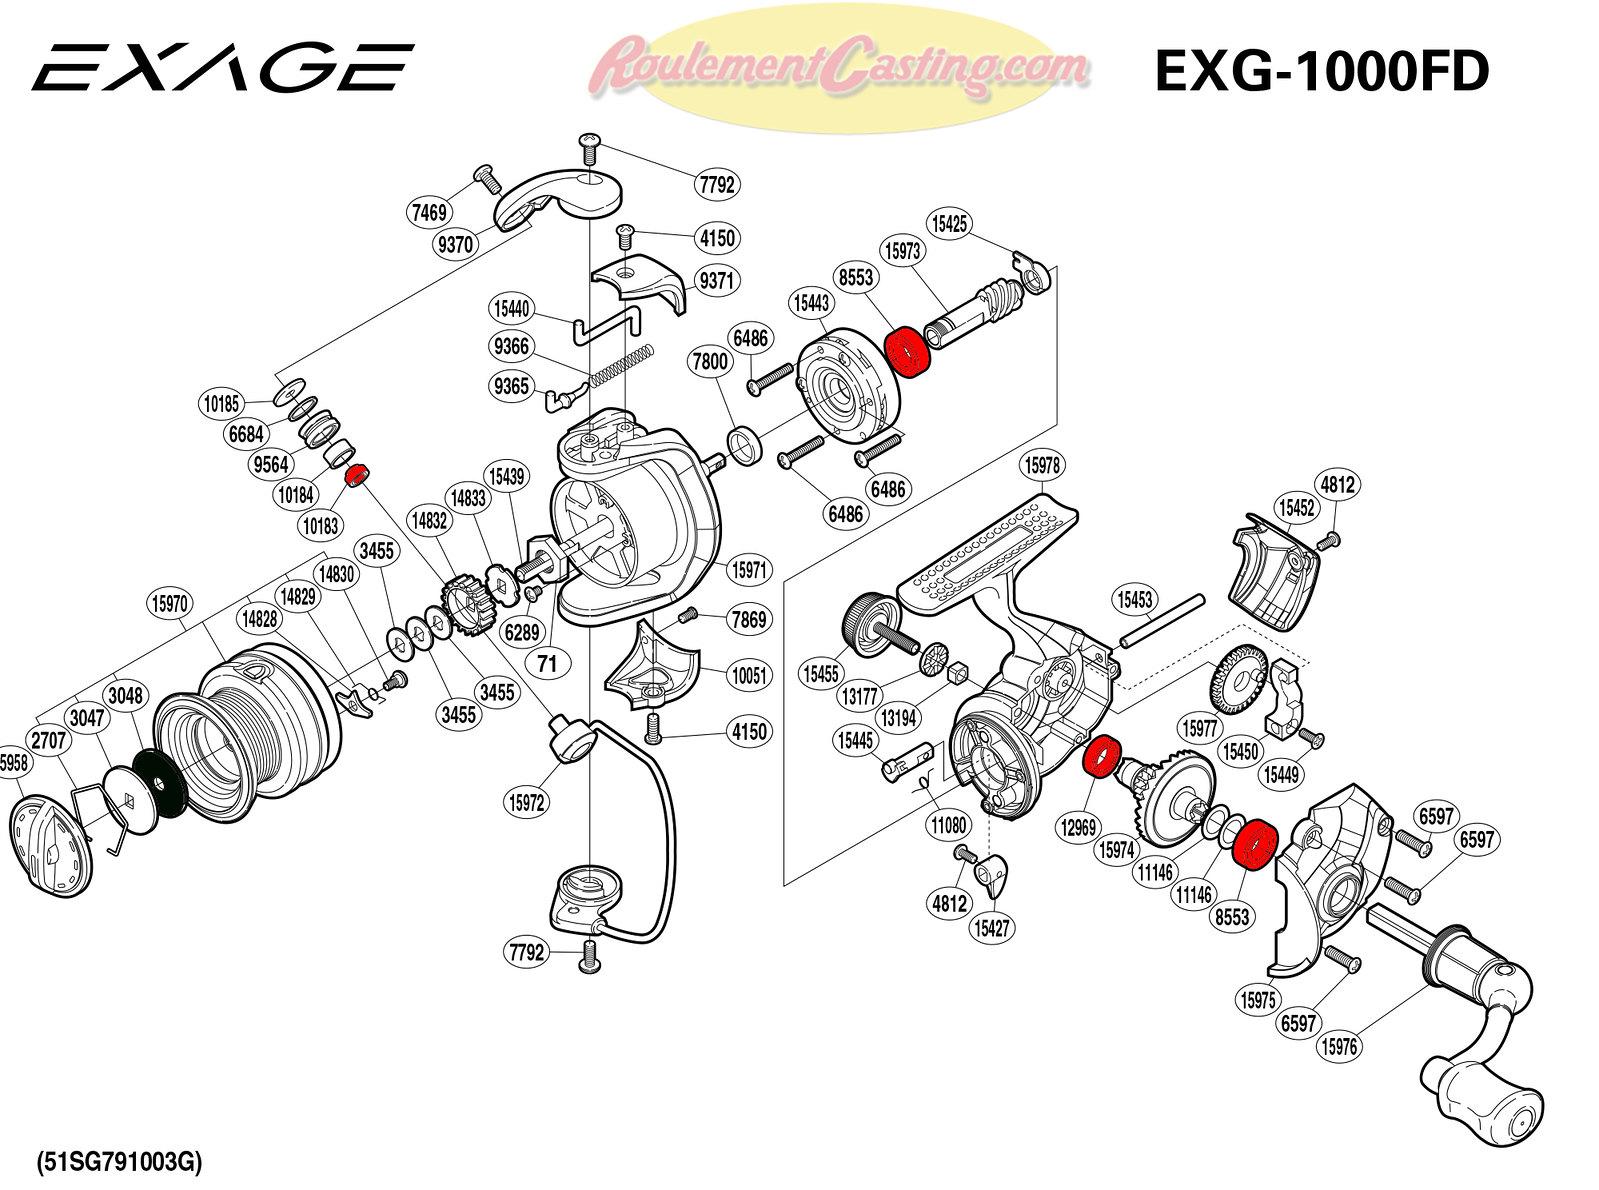 Schema-Shimano-EXAGE-1000FD